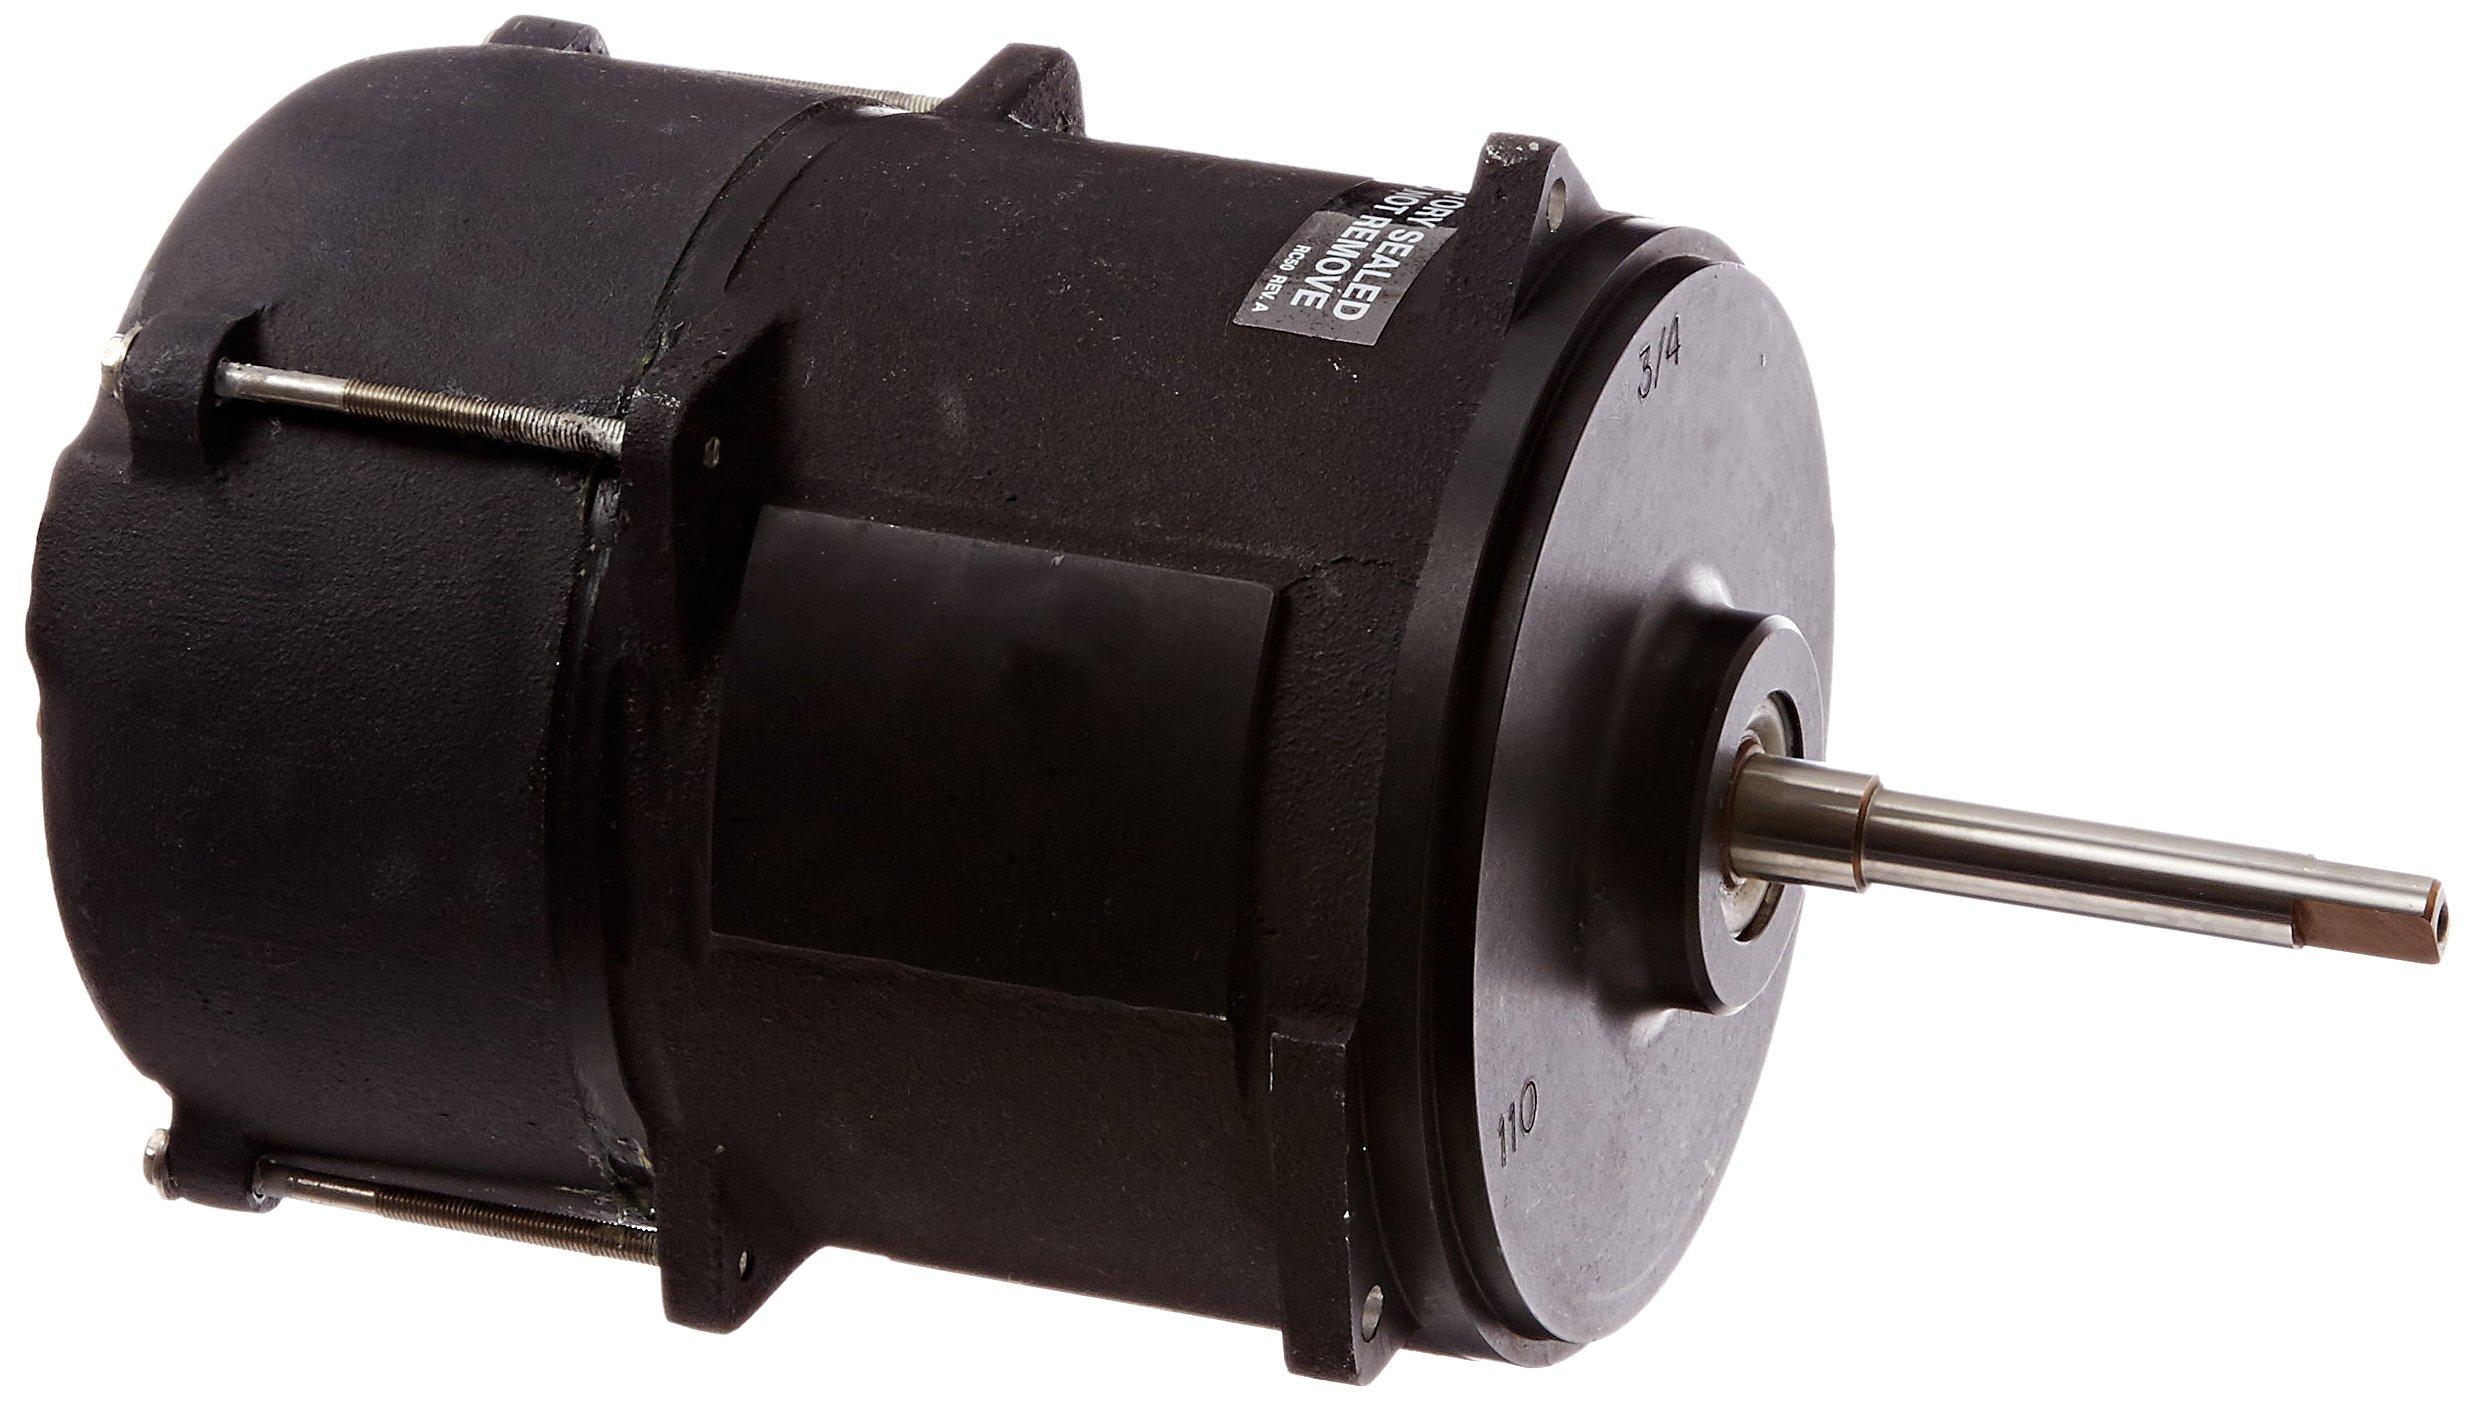 Hayward RCX400388 3/4-Horsepower NSPI King Motor Replacement for Hayward Commercial Cleaner